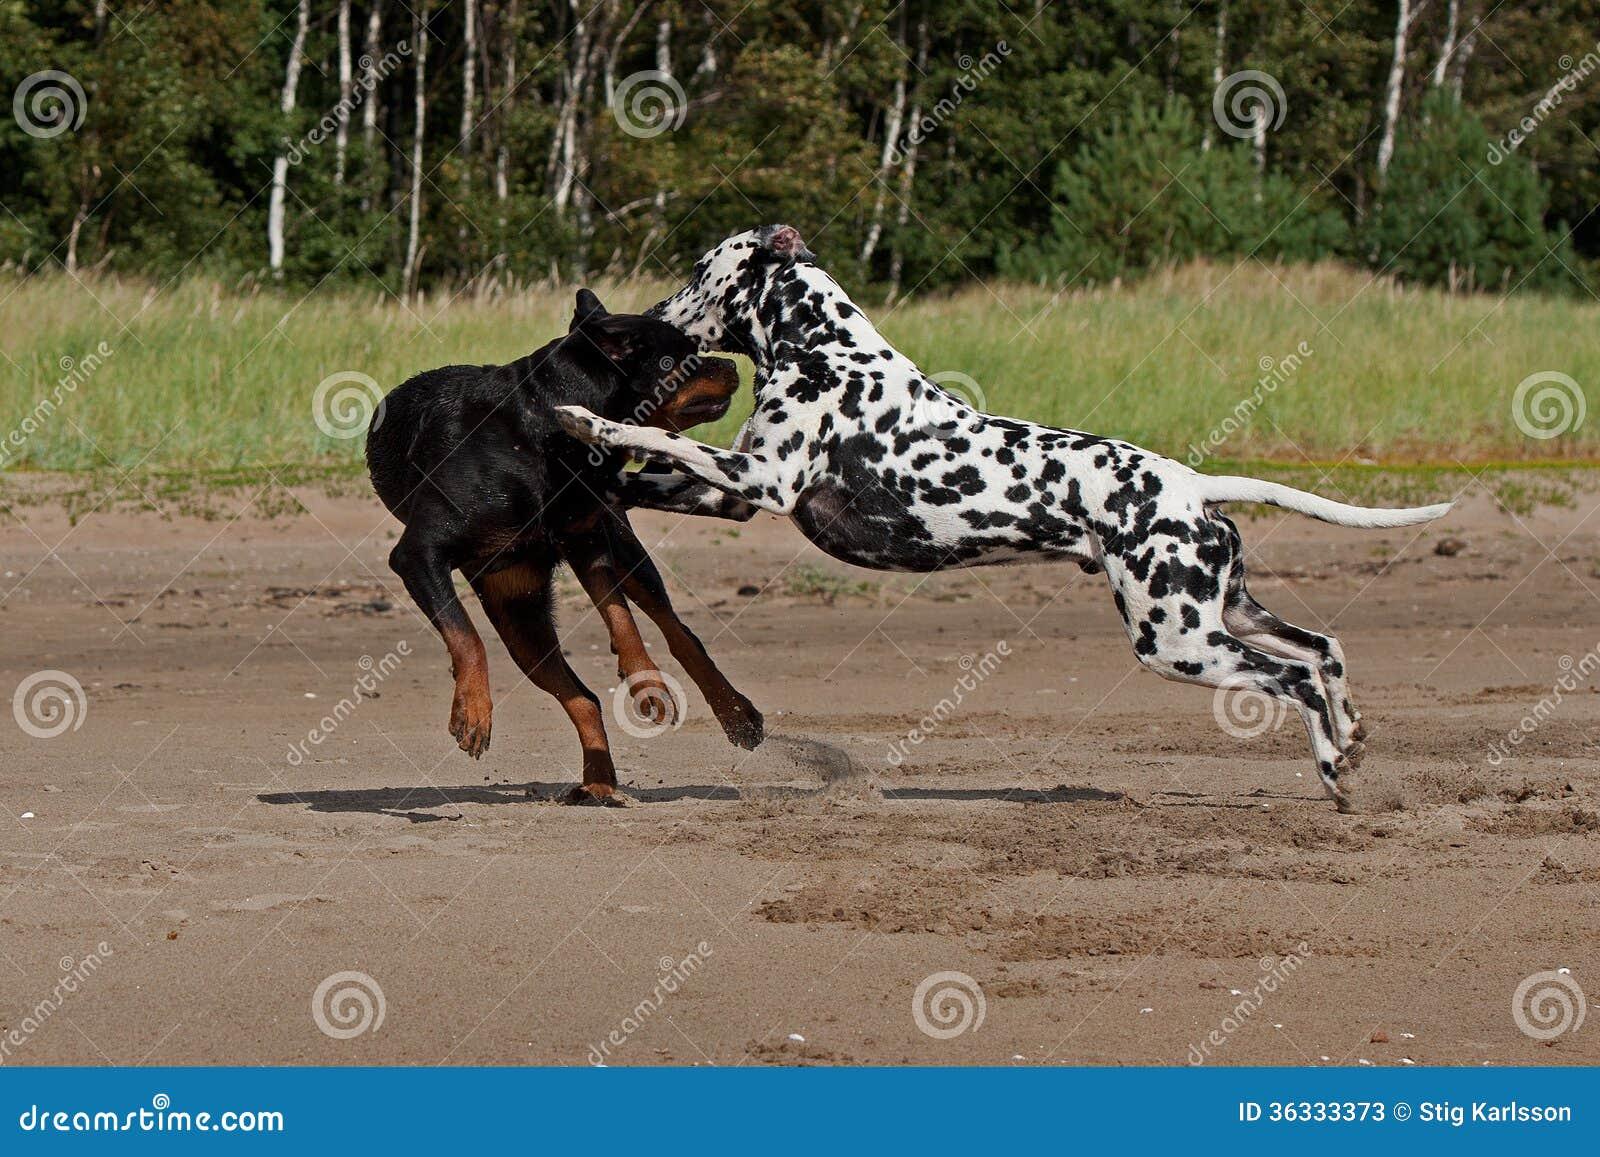 Pitbull Dog Fight Free Videos